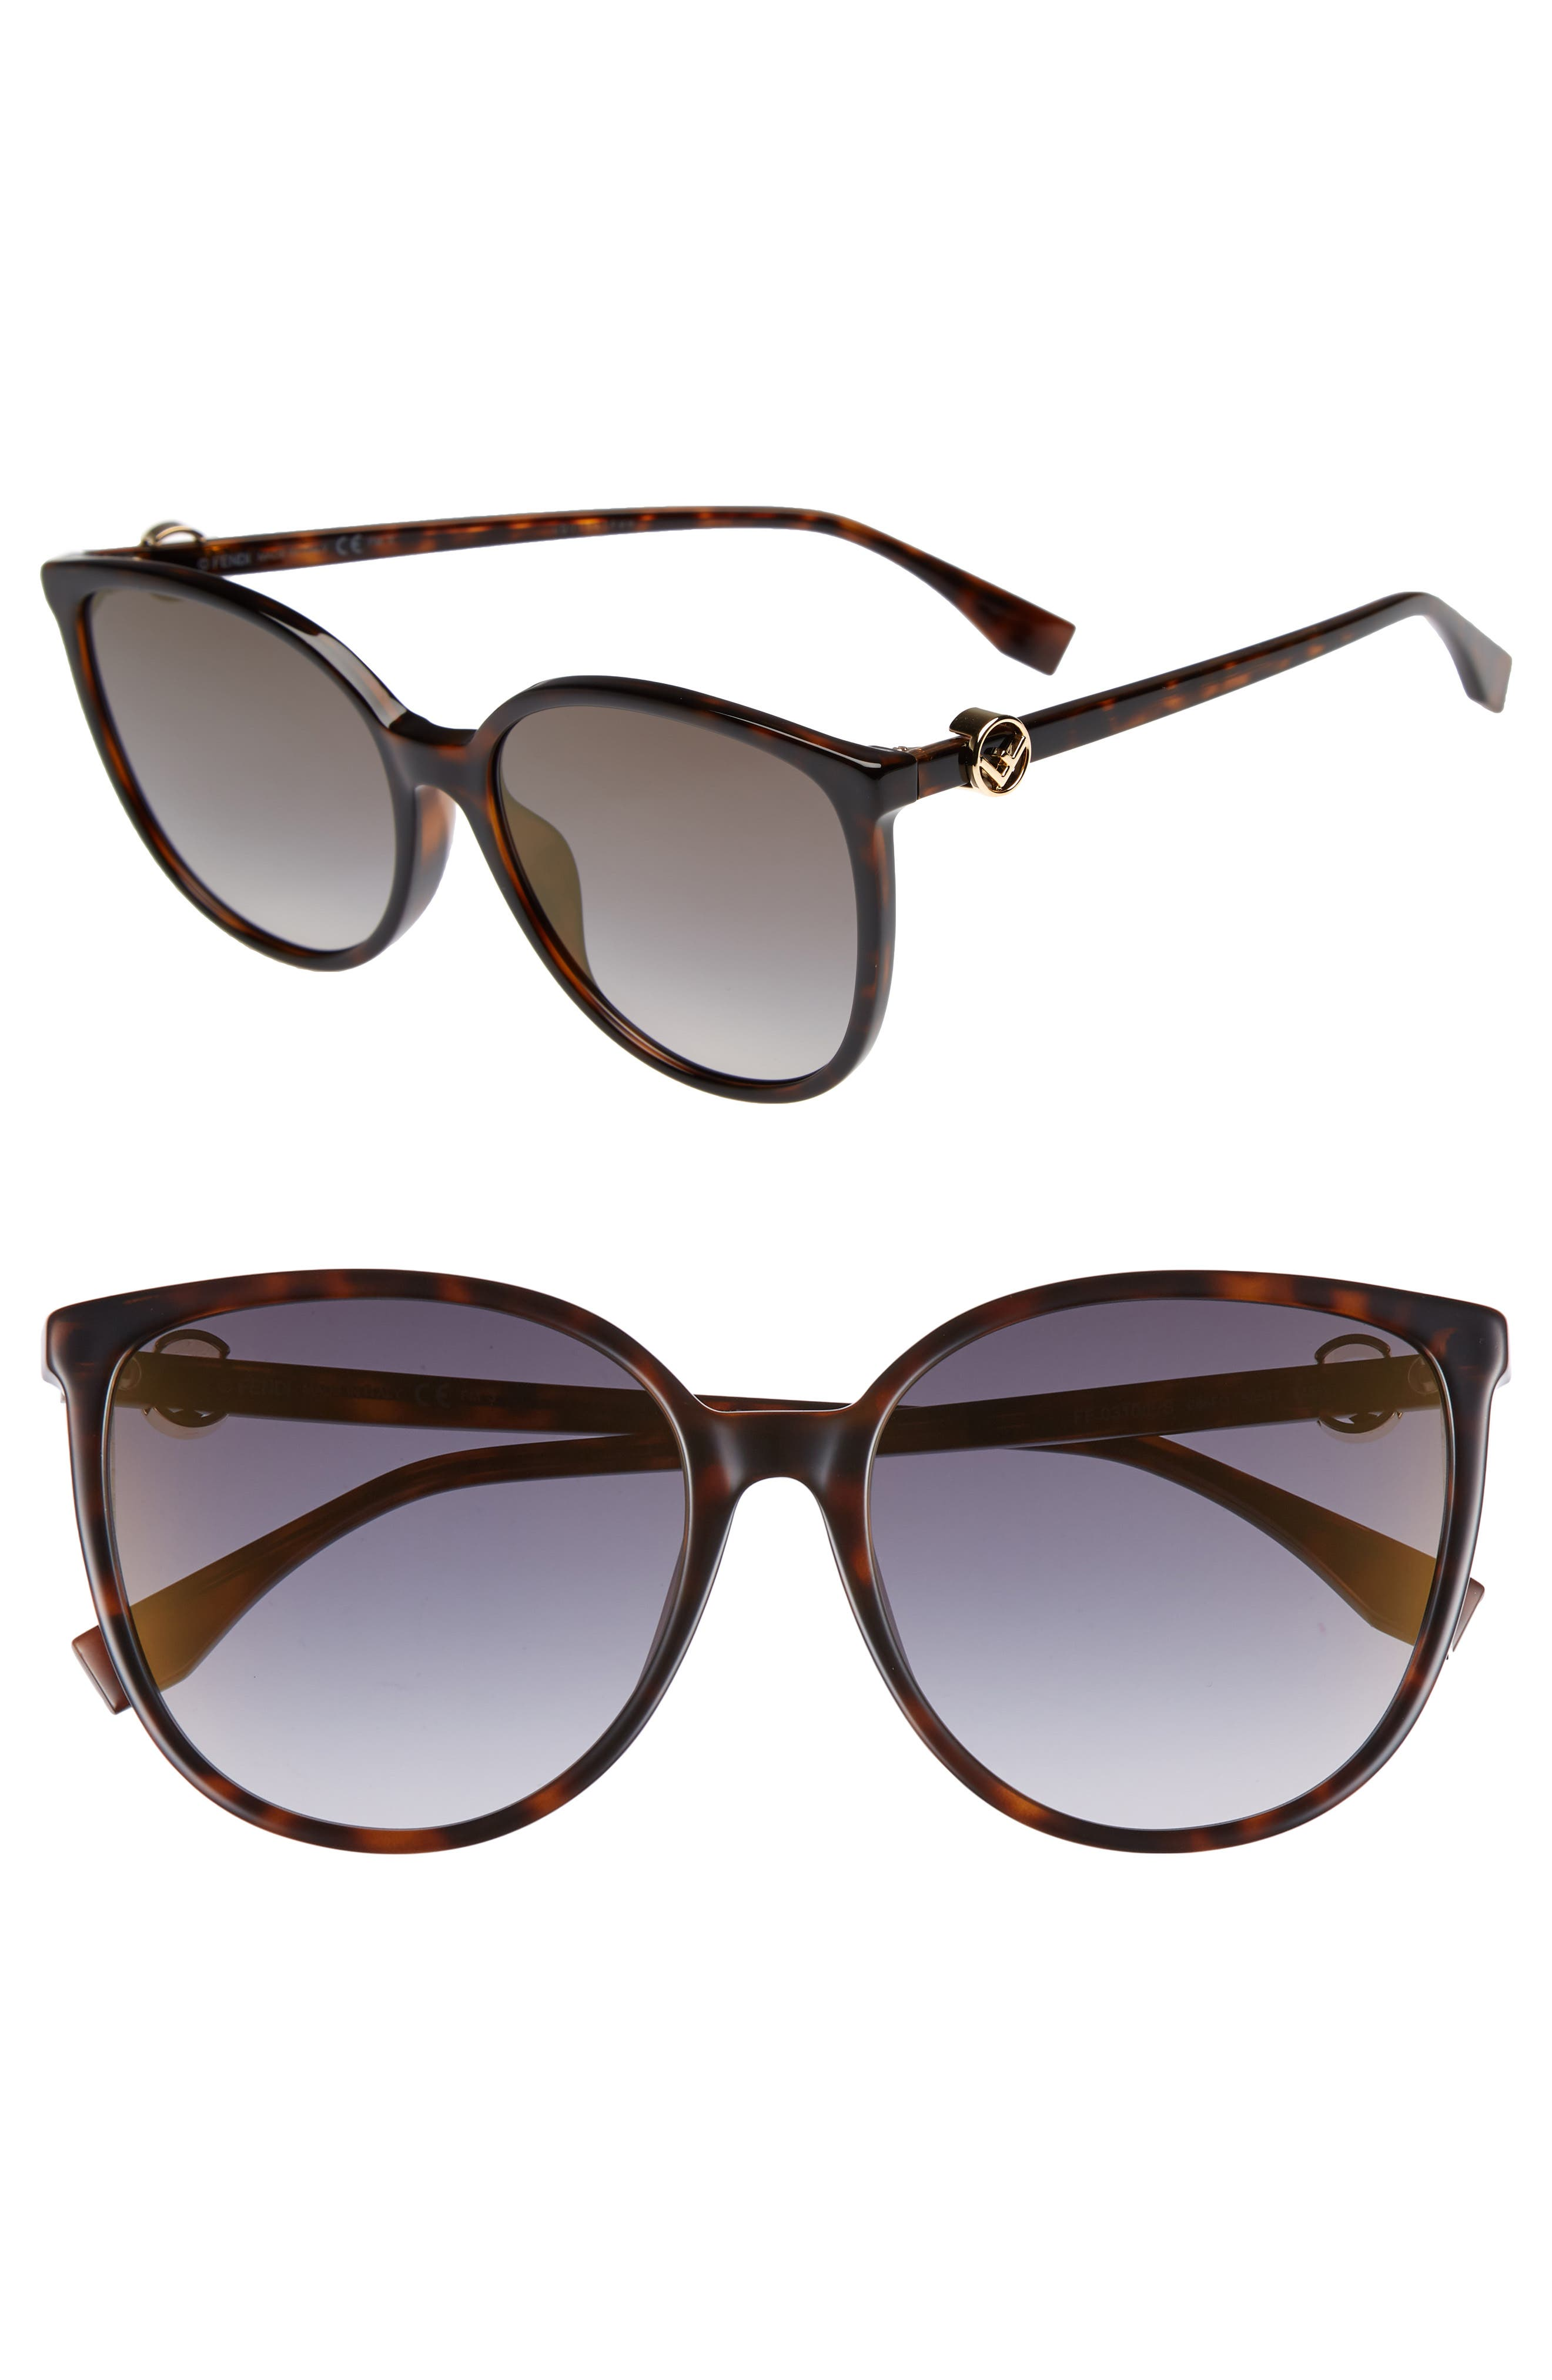 58mm Retro Special Fit Sunglasses,                         Main,                         color, Dark Havana